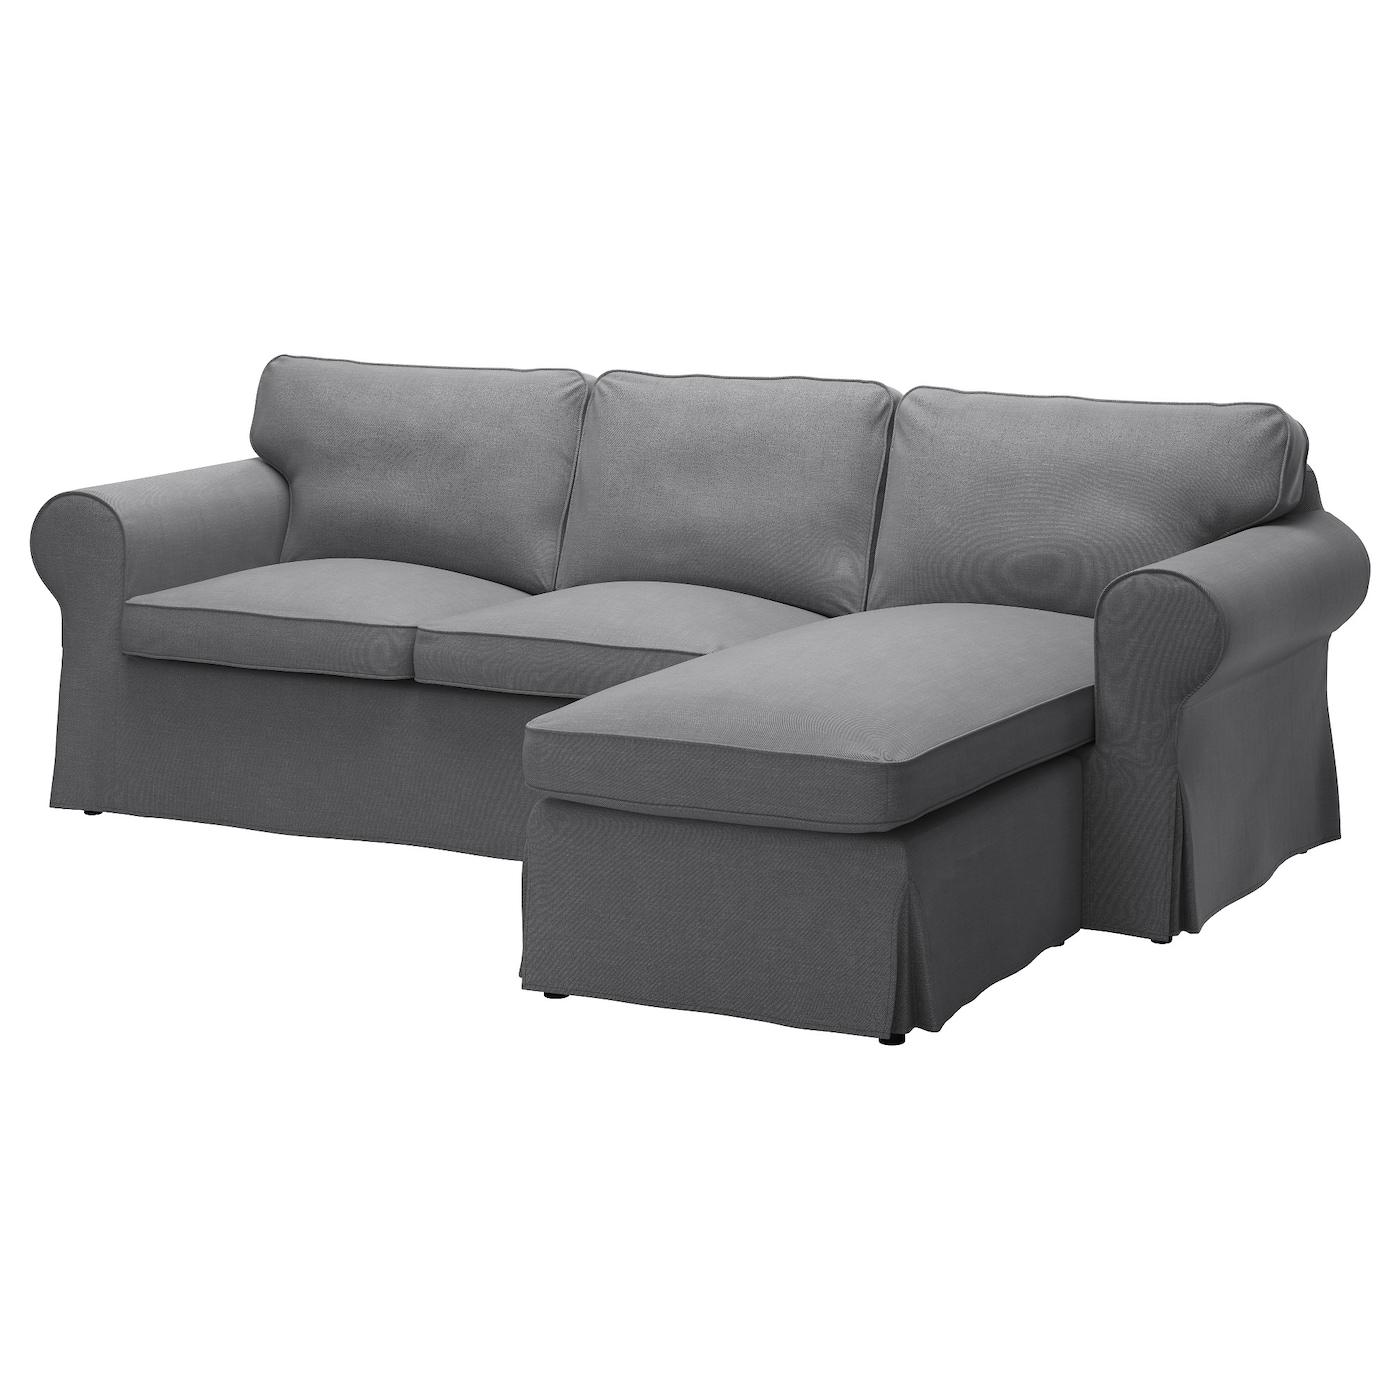 Hoekbank Chaise Lounge.3 Seat Sofa Ektorp Nordvalla With Chaise Longue Nordvalla Dark Grey